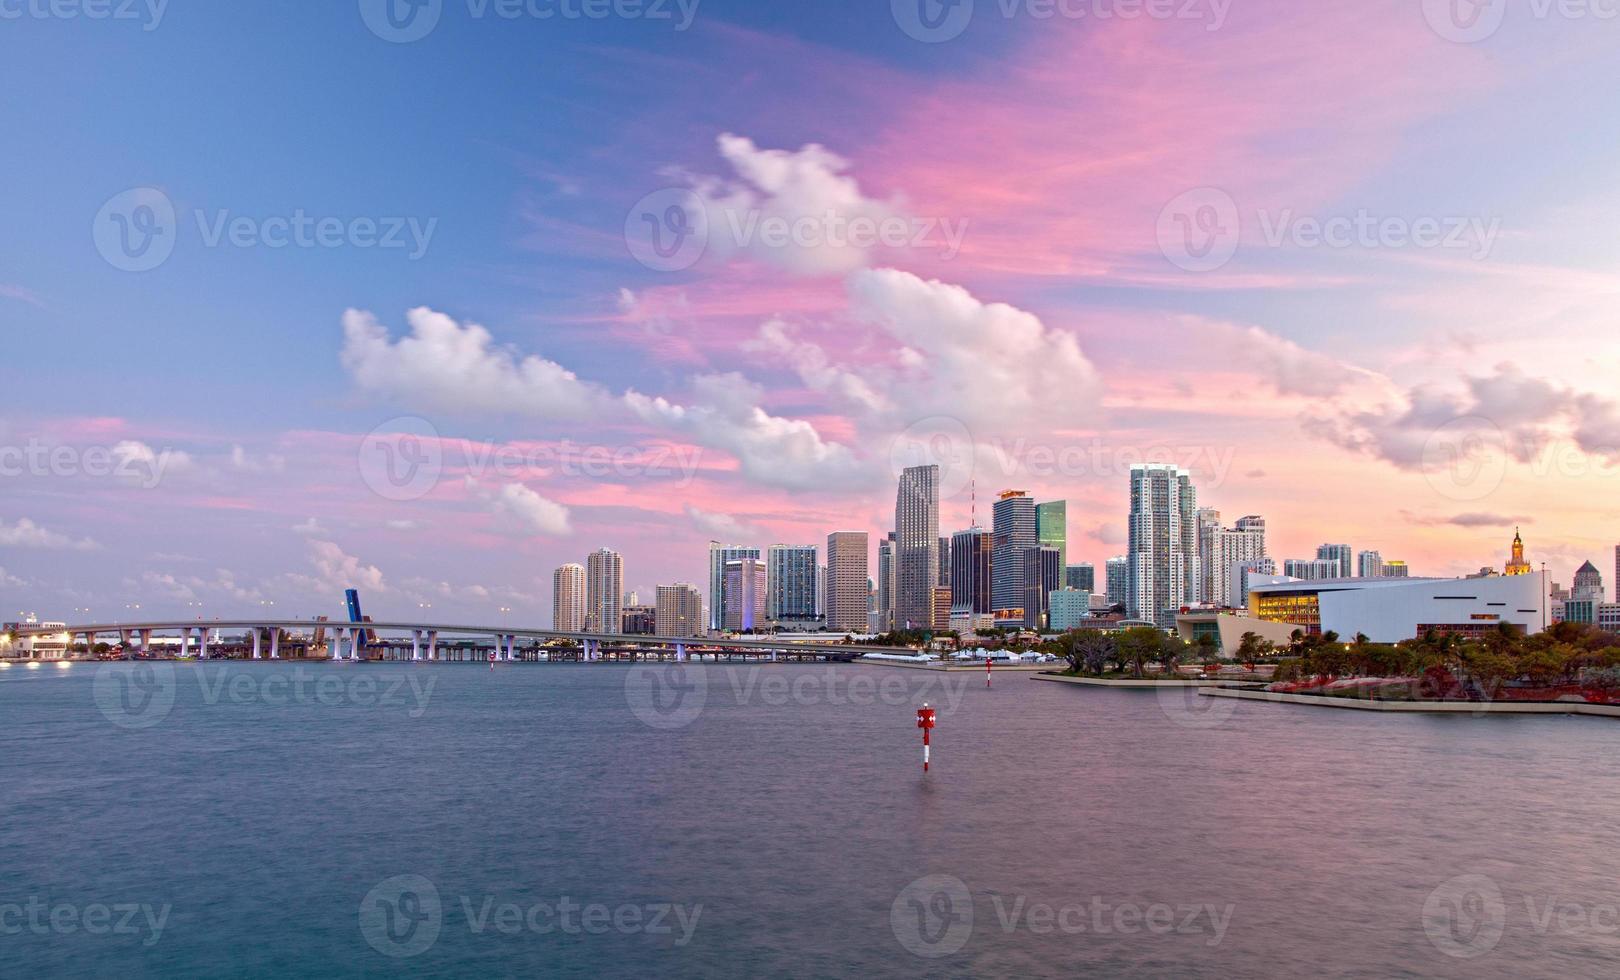 staden Miami florida, färgglada solnedgångs panorama i stadens centrum foto